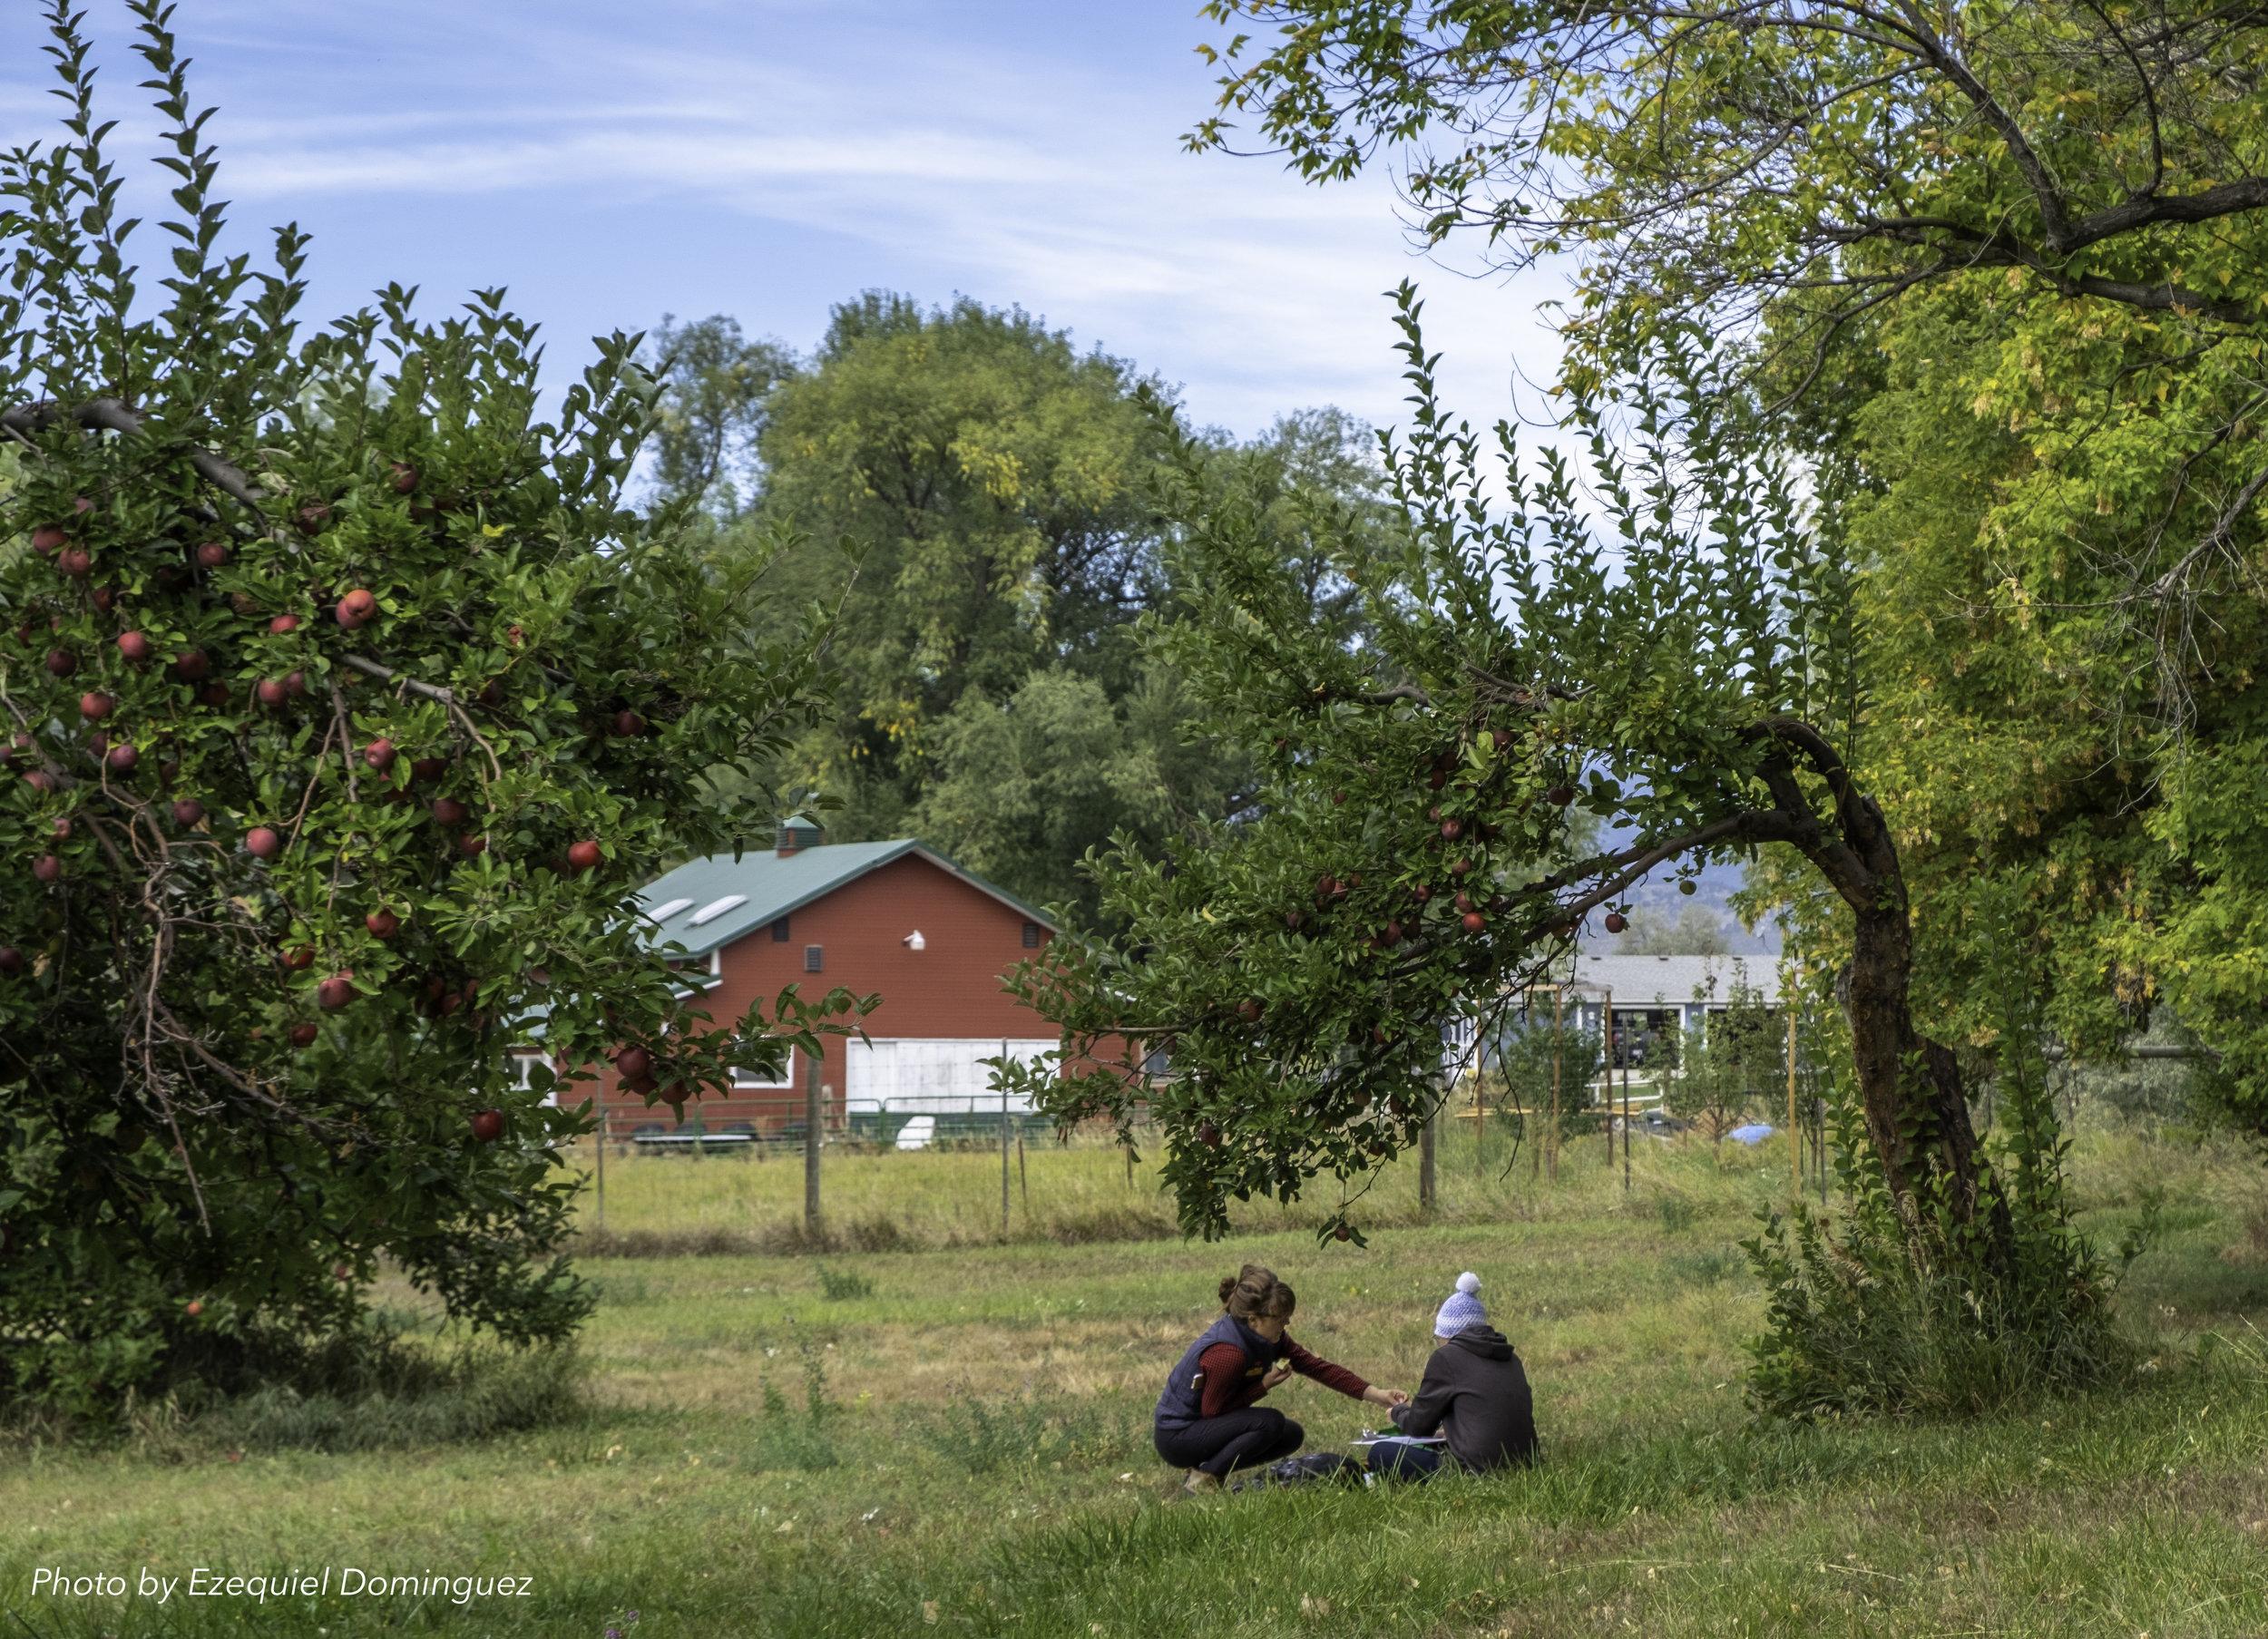 Amelia & Sarah surveying a historic apple orchard in Hygiene. Photo by Ezekiel Dominguez.